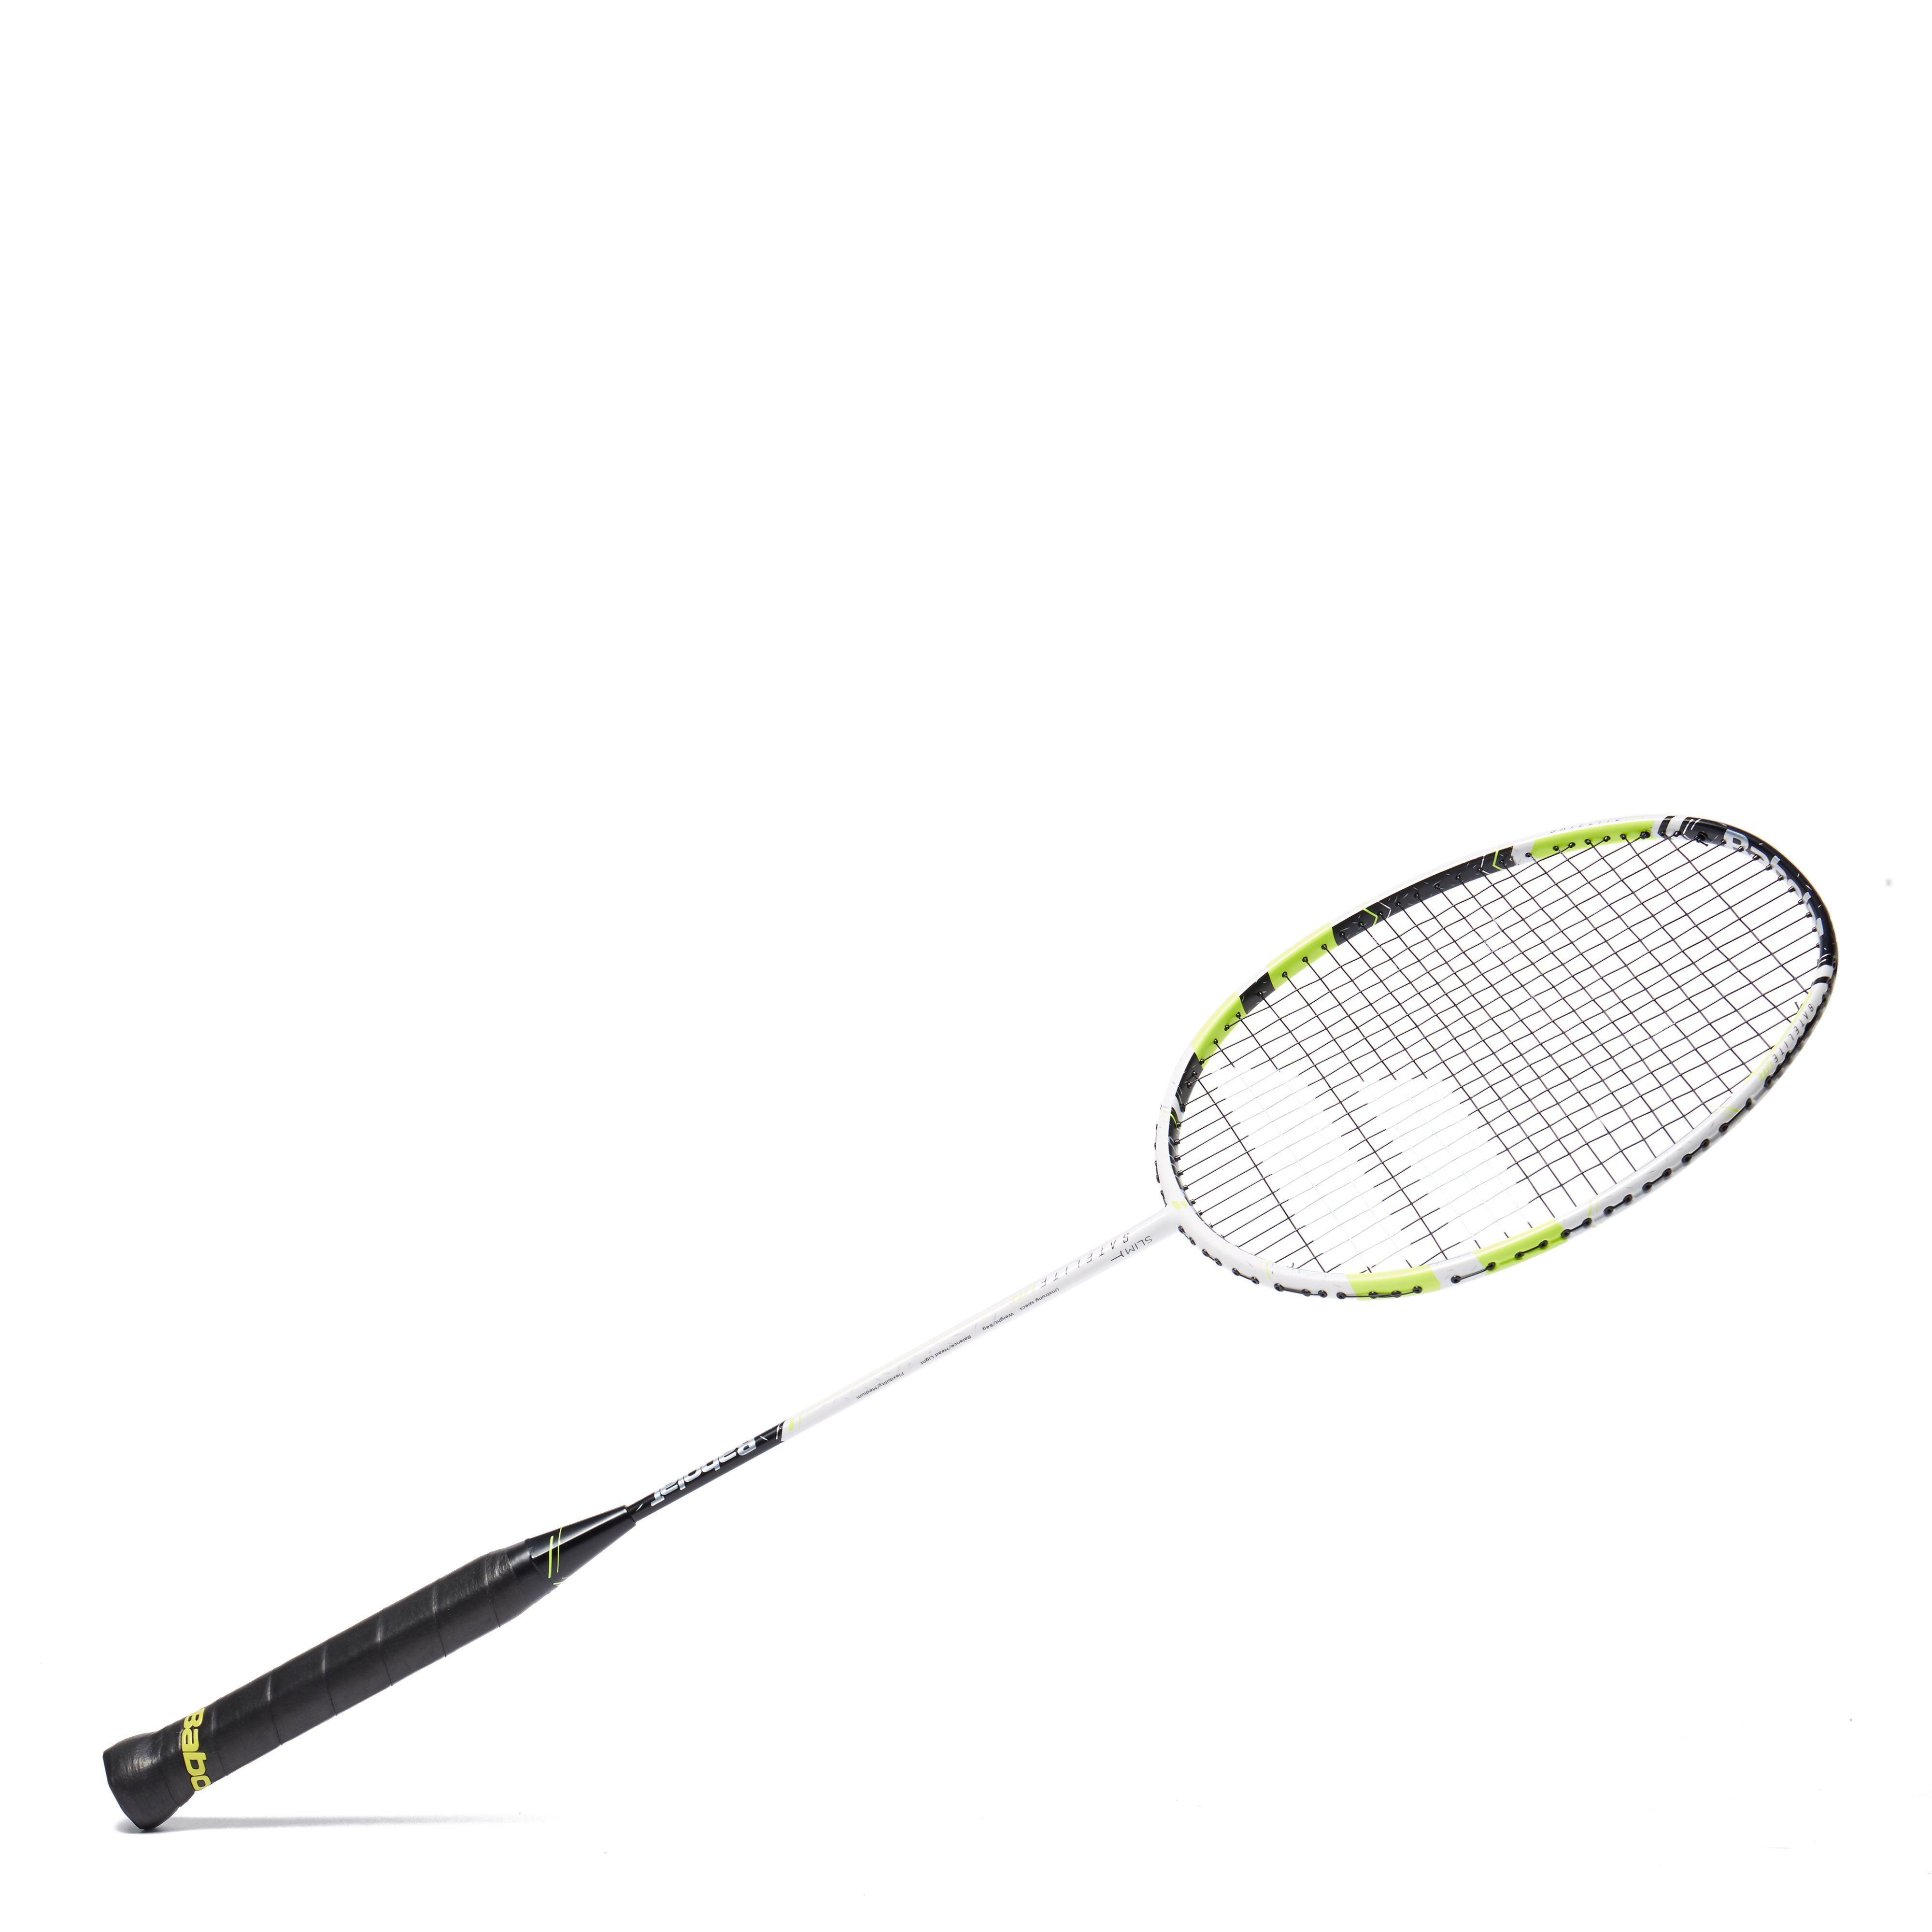 Babolat Satelite Lite Badminton Racket